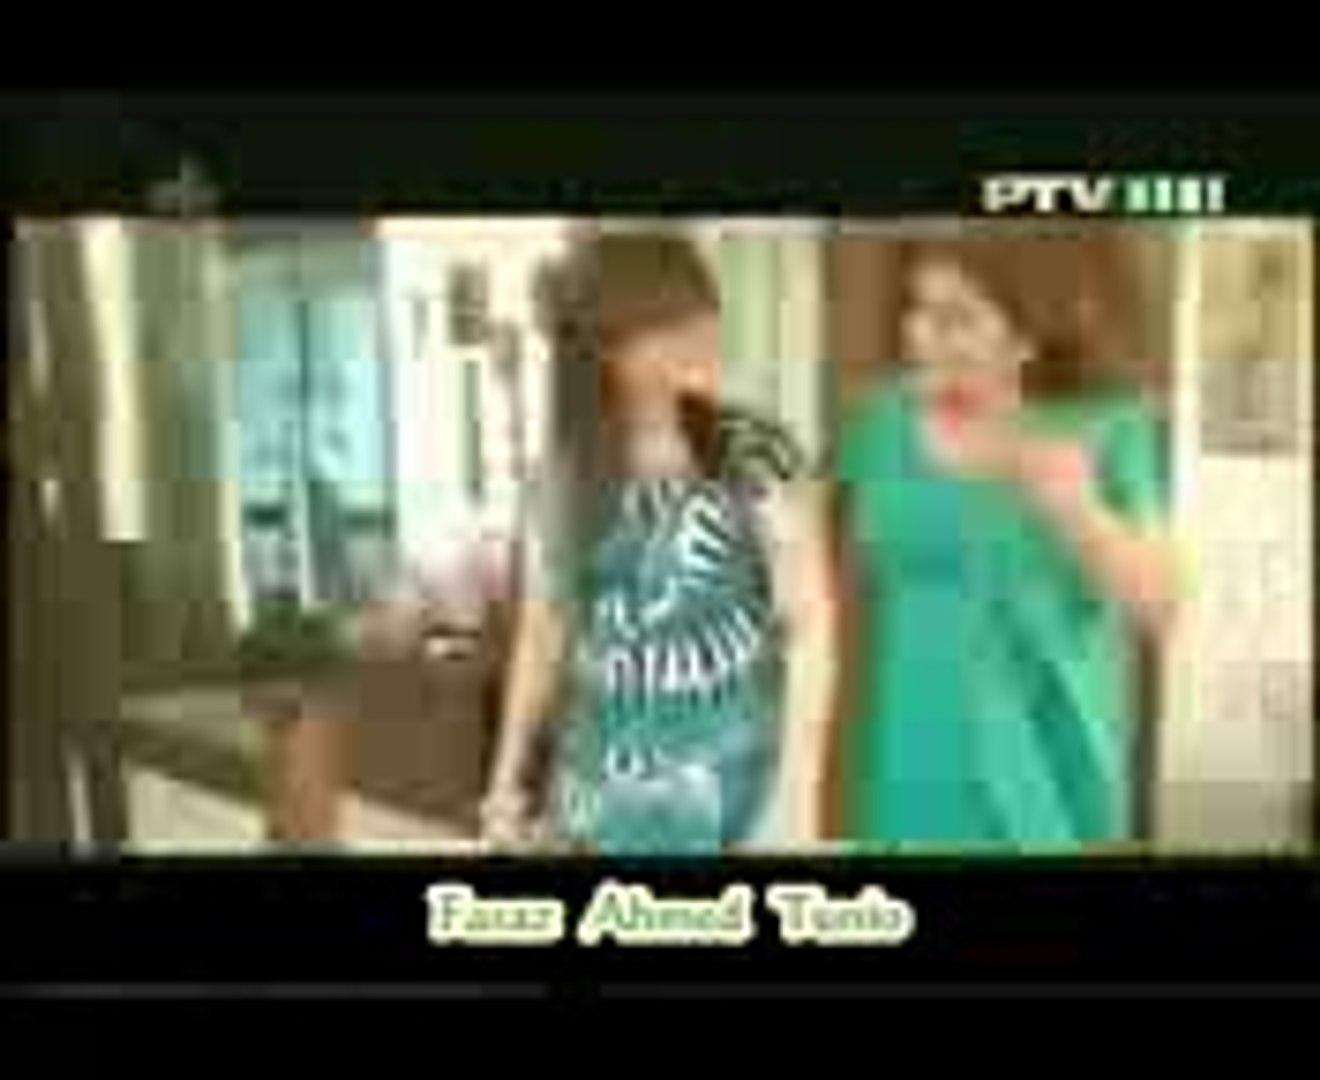 ptv drama din dhallay title song mp3